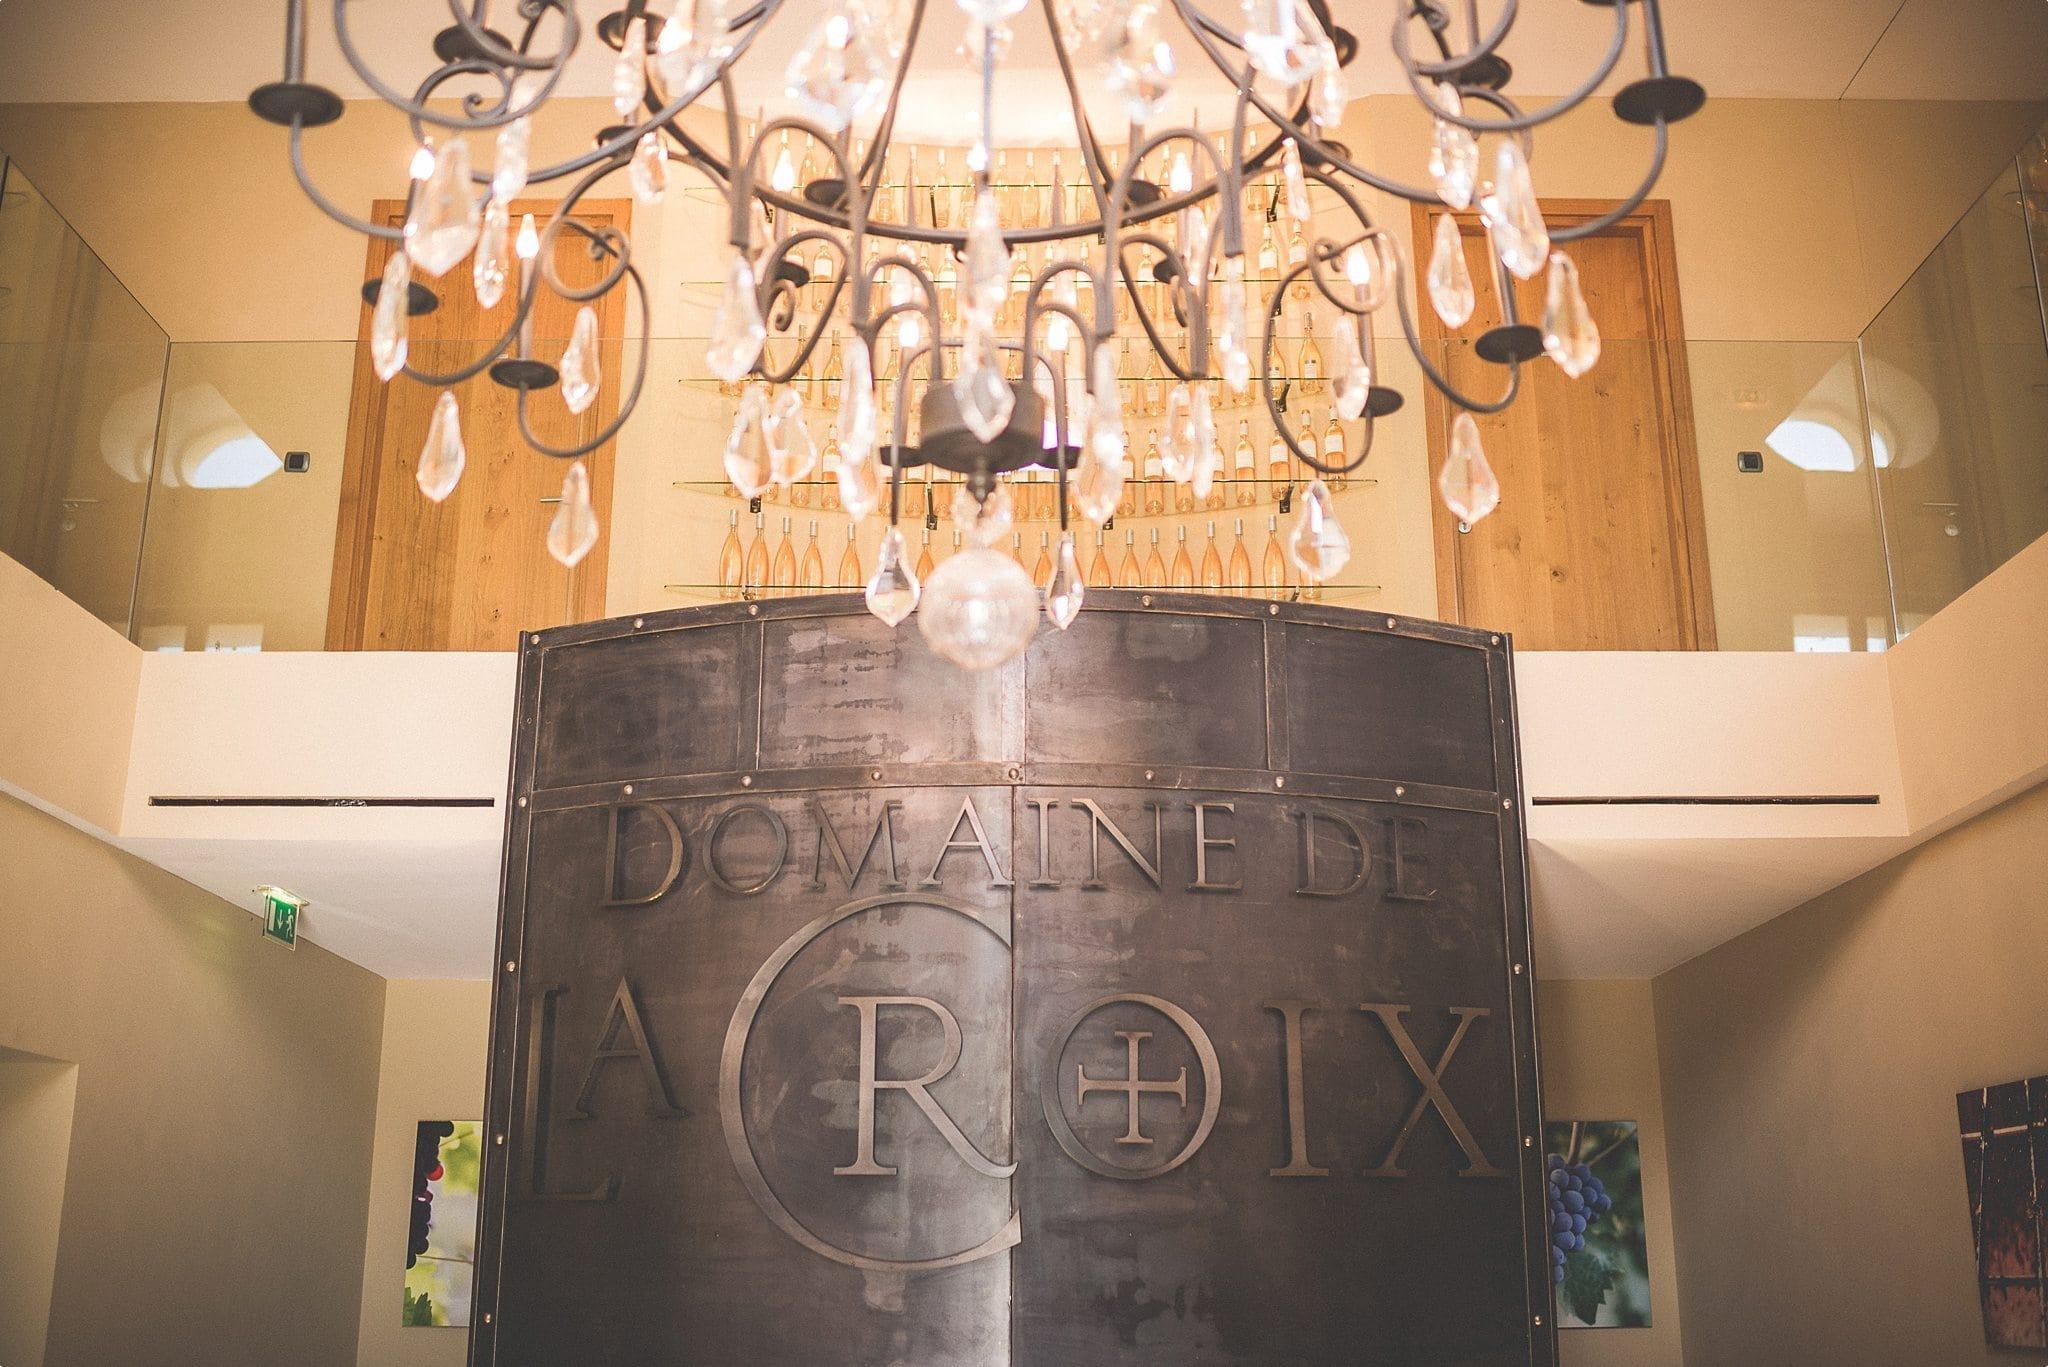 Domaine de la Croix - Wedding - Maria Assia Photography-34